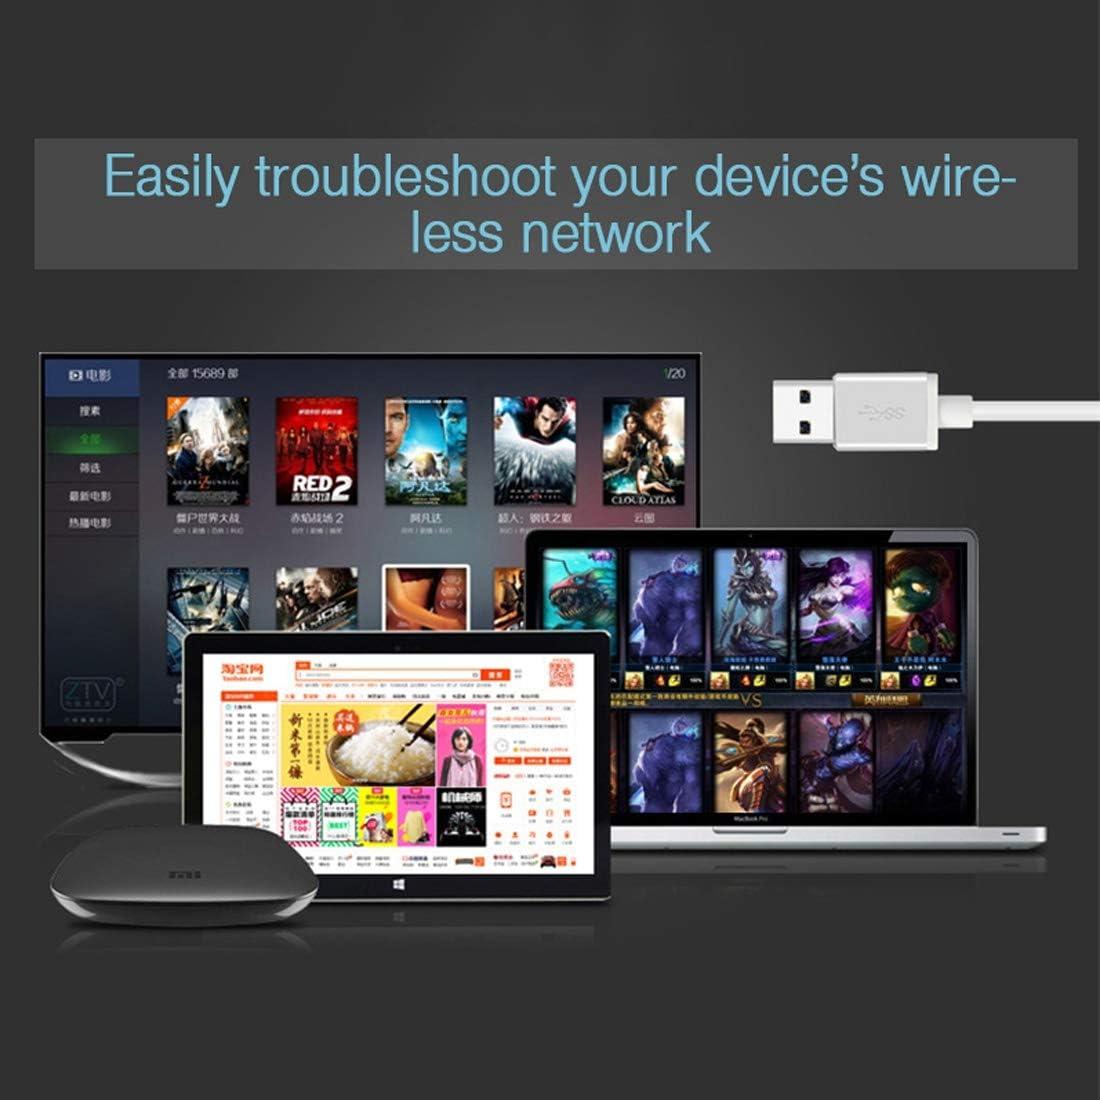 Aluminum Shell 3 USB3.0 Ports HUB USB3.0 Gigabit Ethernet Adapter for MacBook